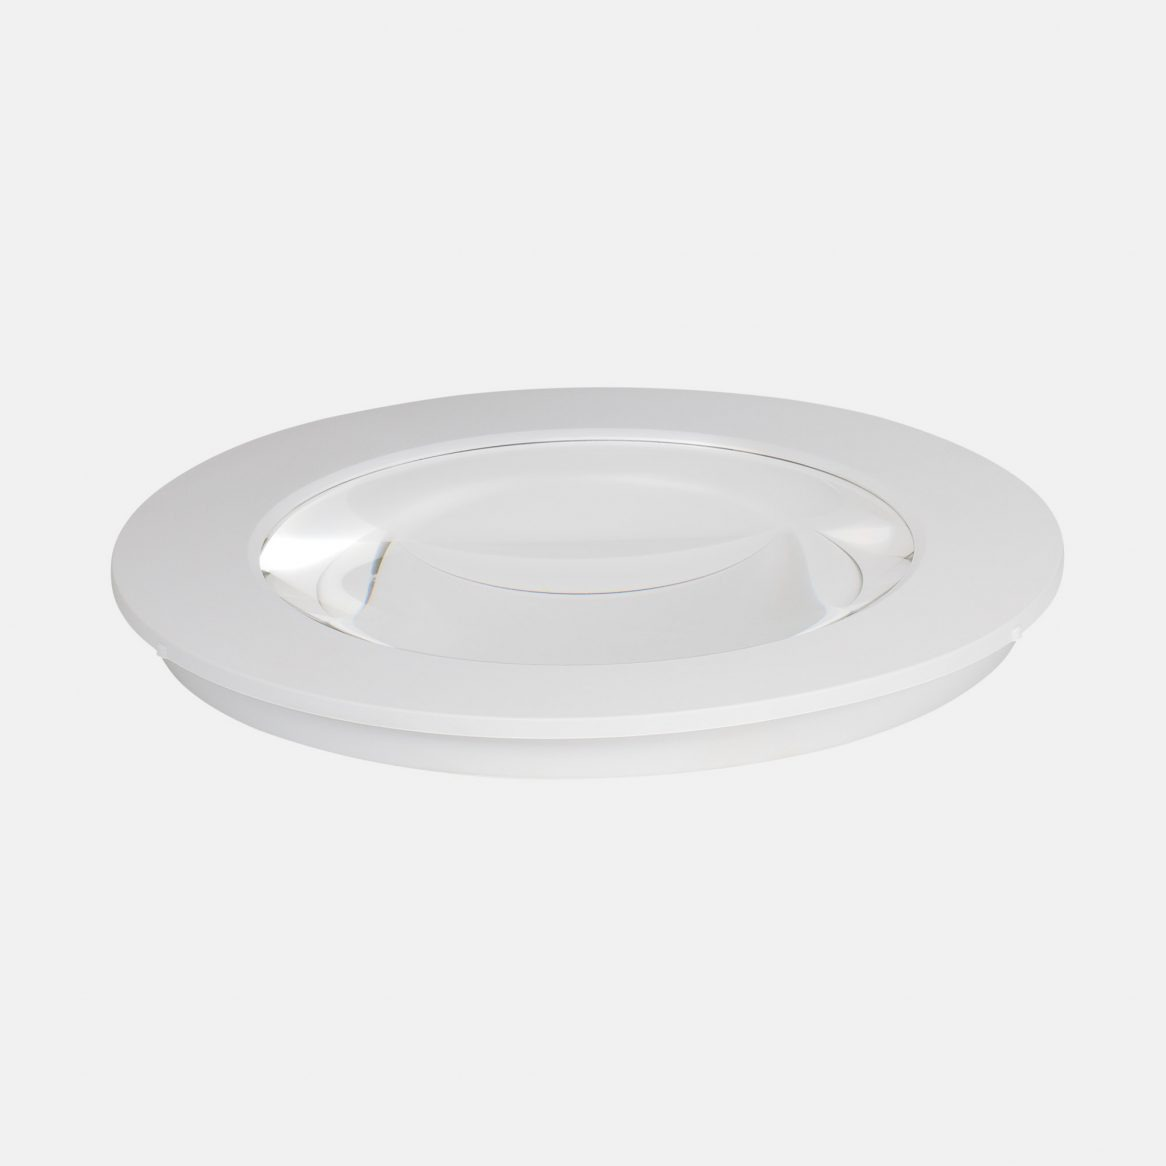 5 dioptres lens - White rim